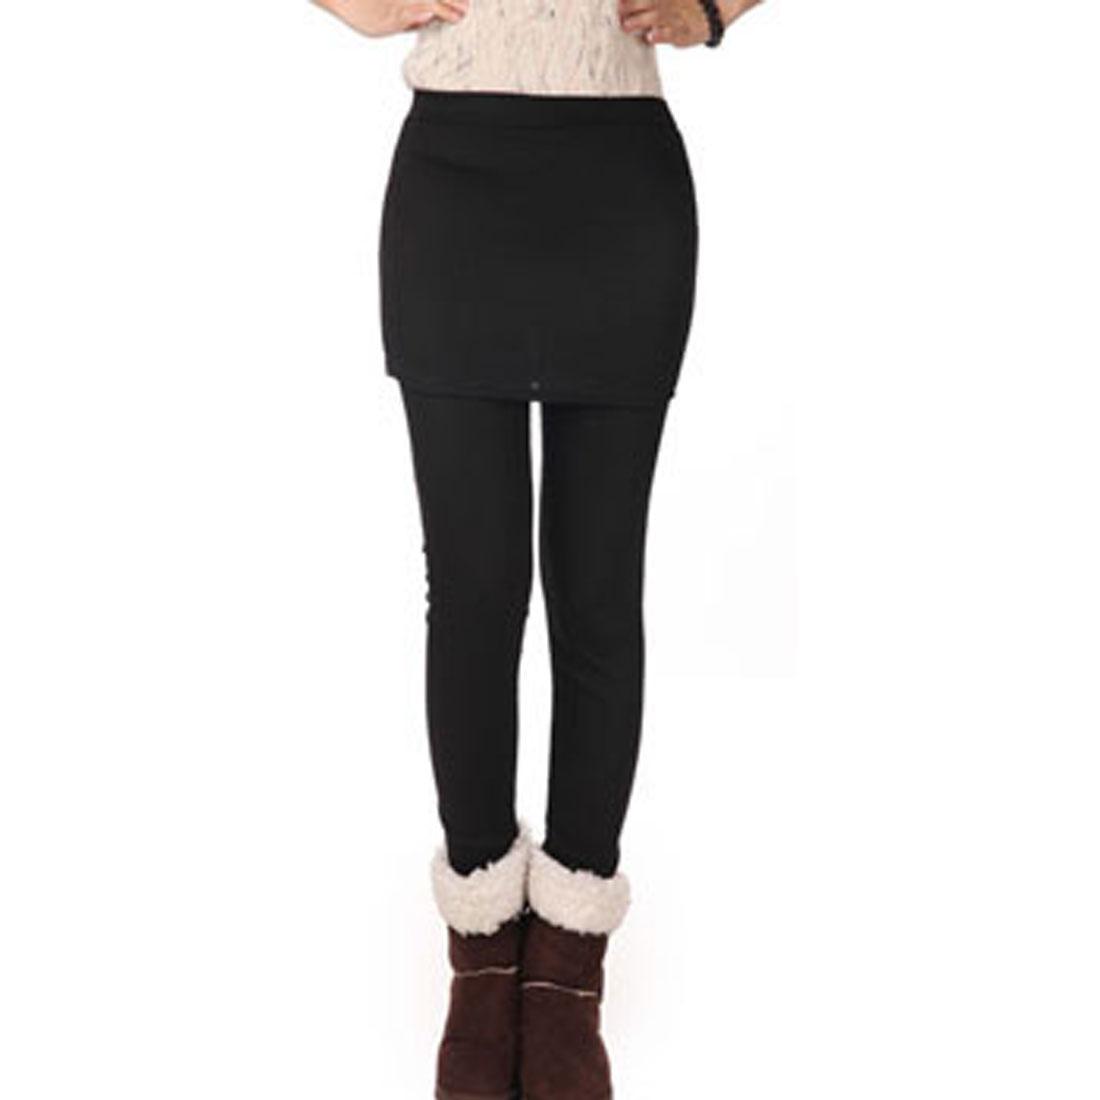 Women Autumn Stretchy Warm Form-Fitting Long Pants Skirt Leggings Black XS